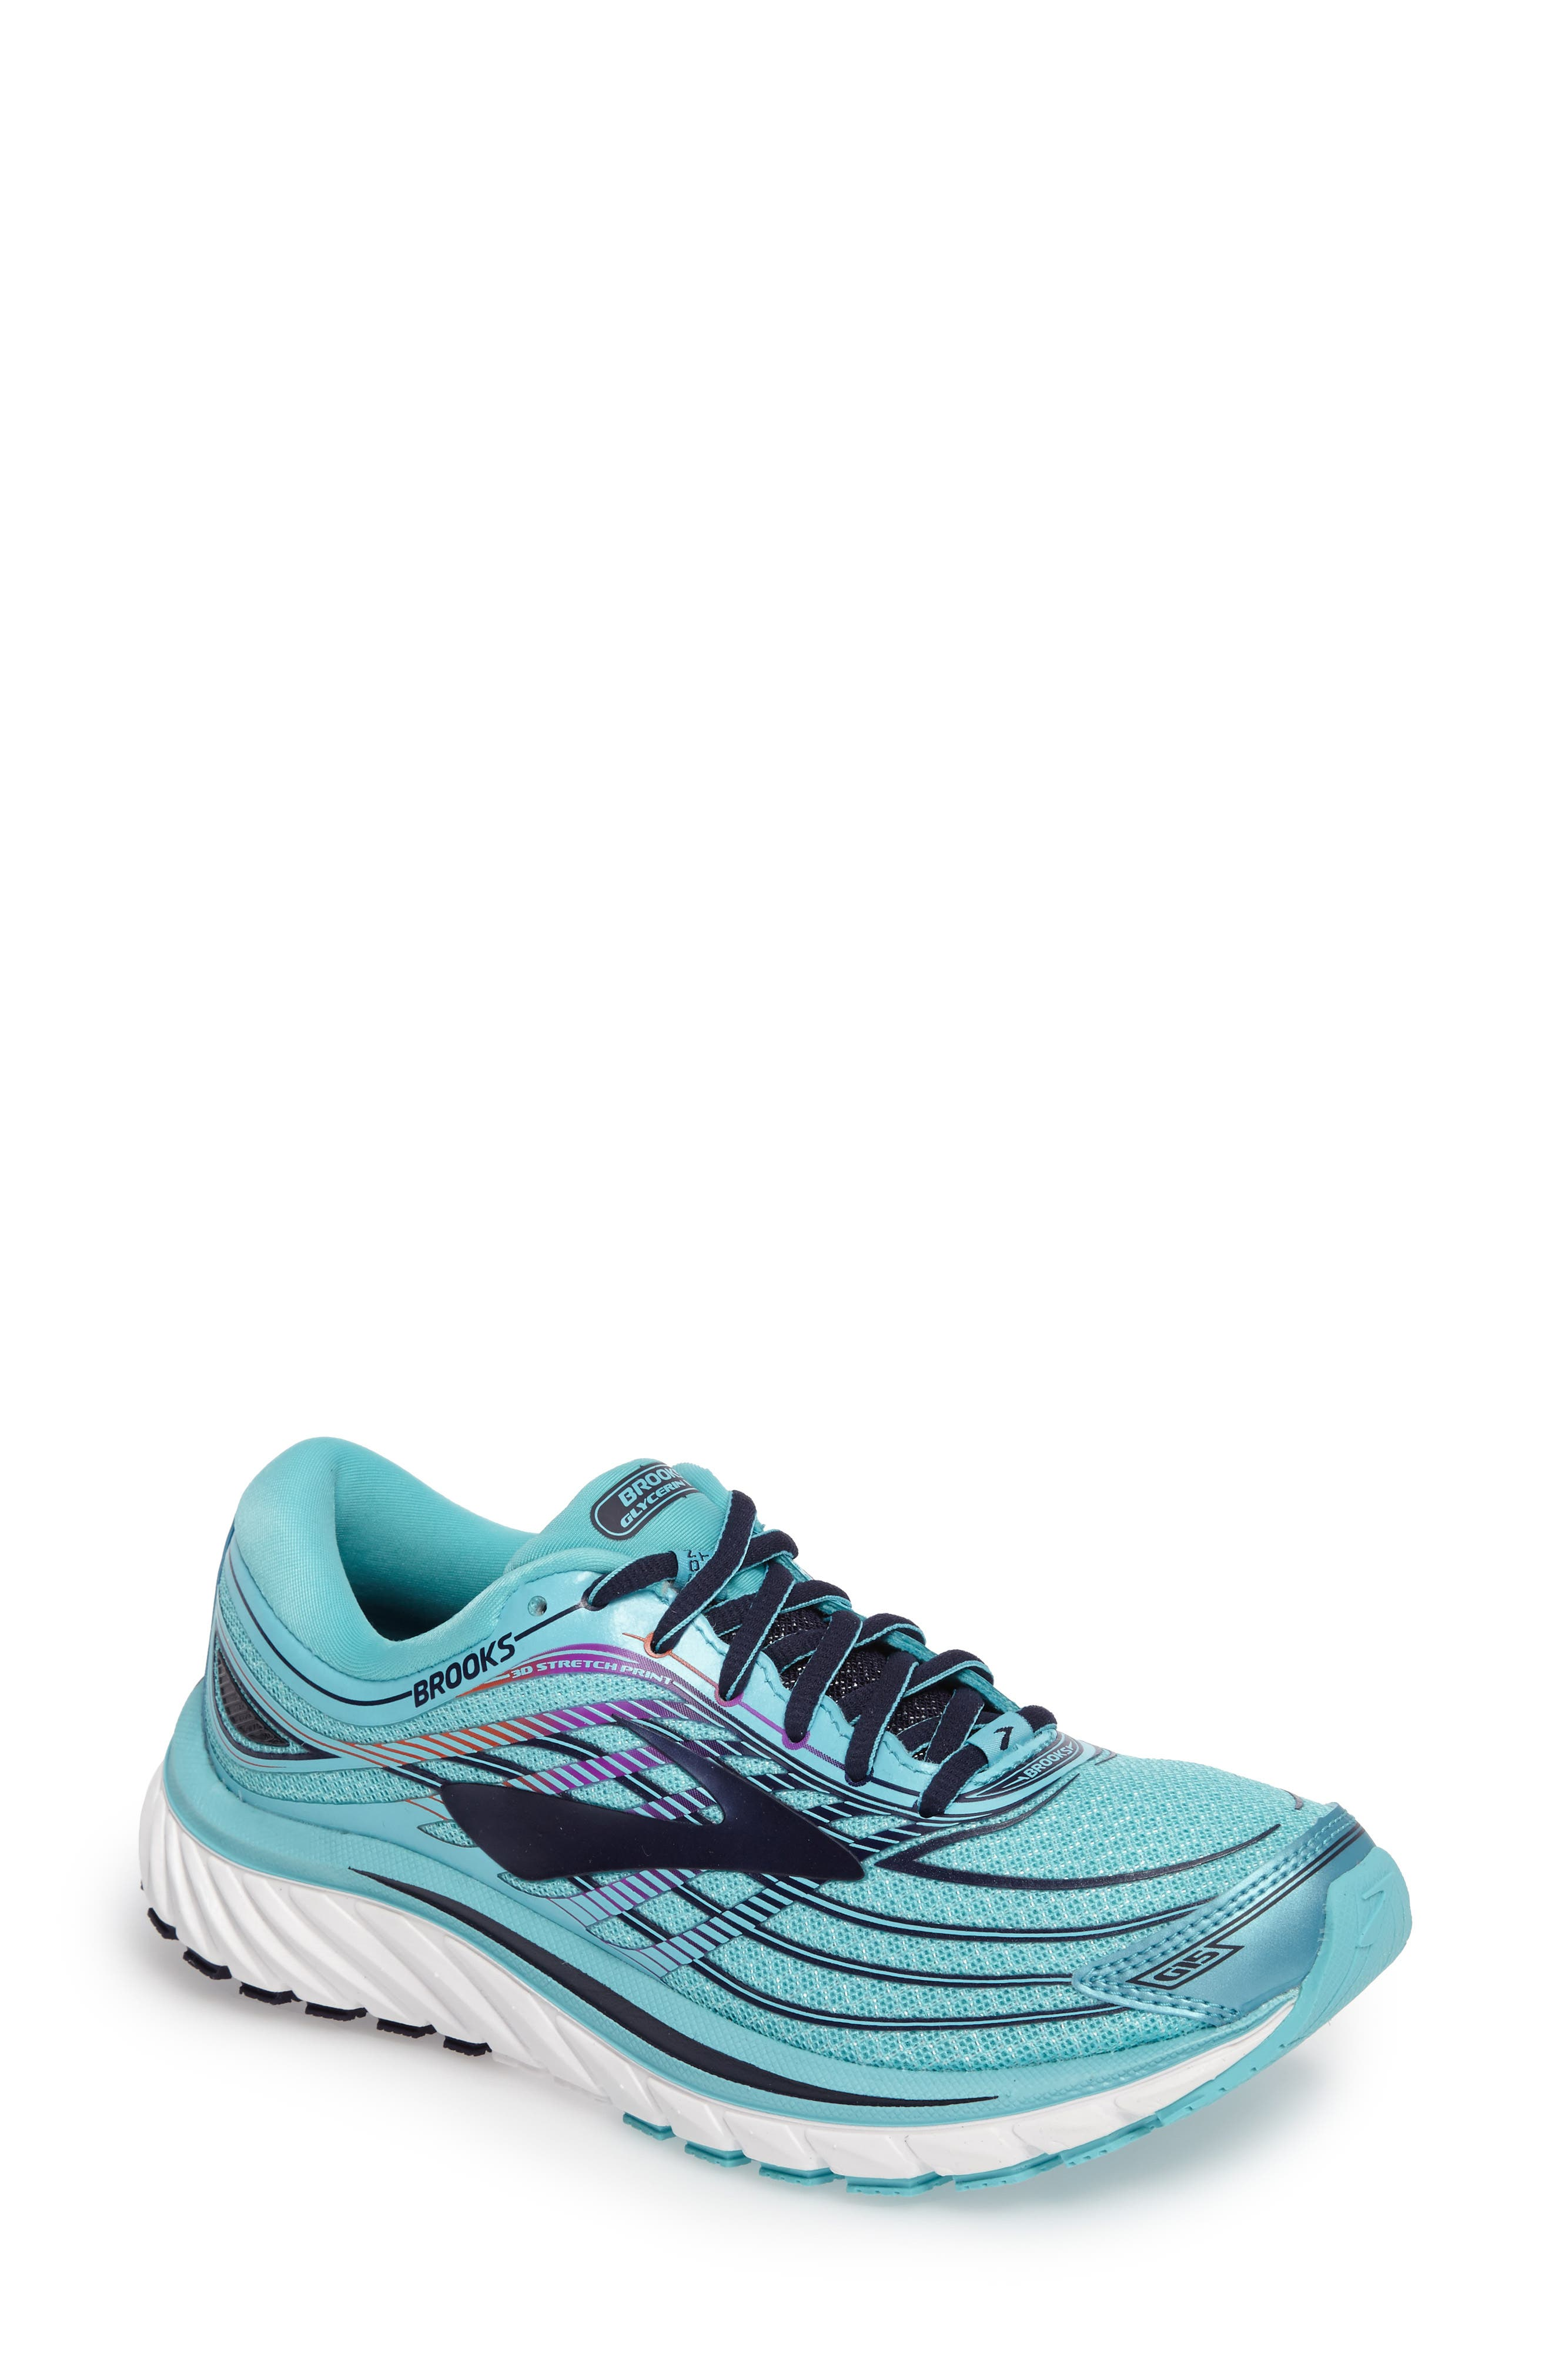 Main Image - Brooks Glycerin 15 Running Shoe (Women)